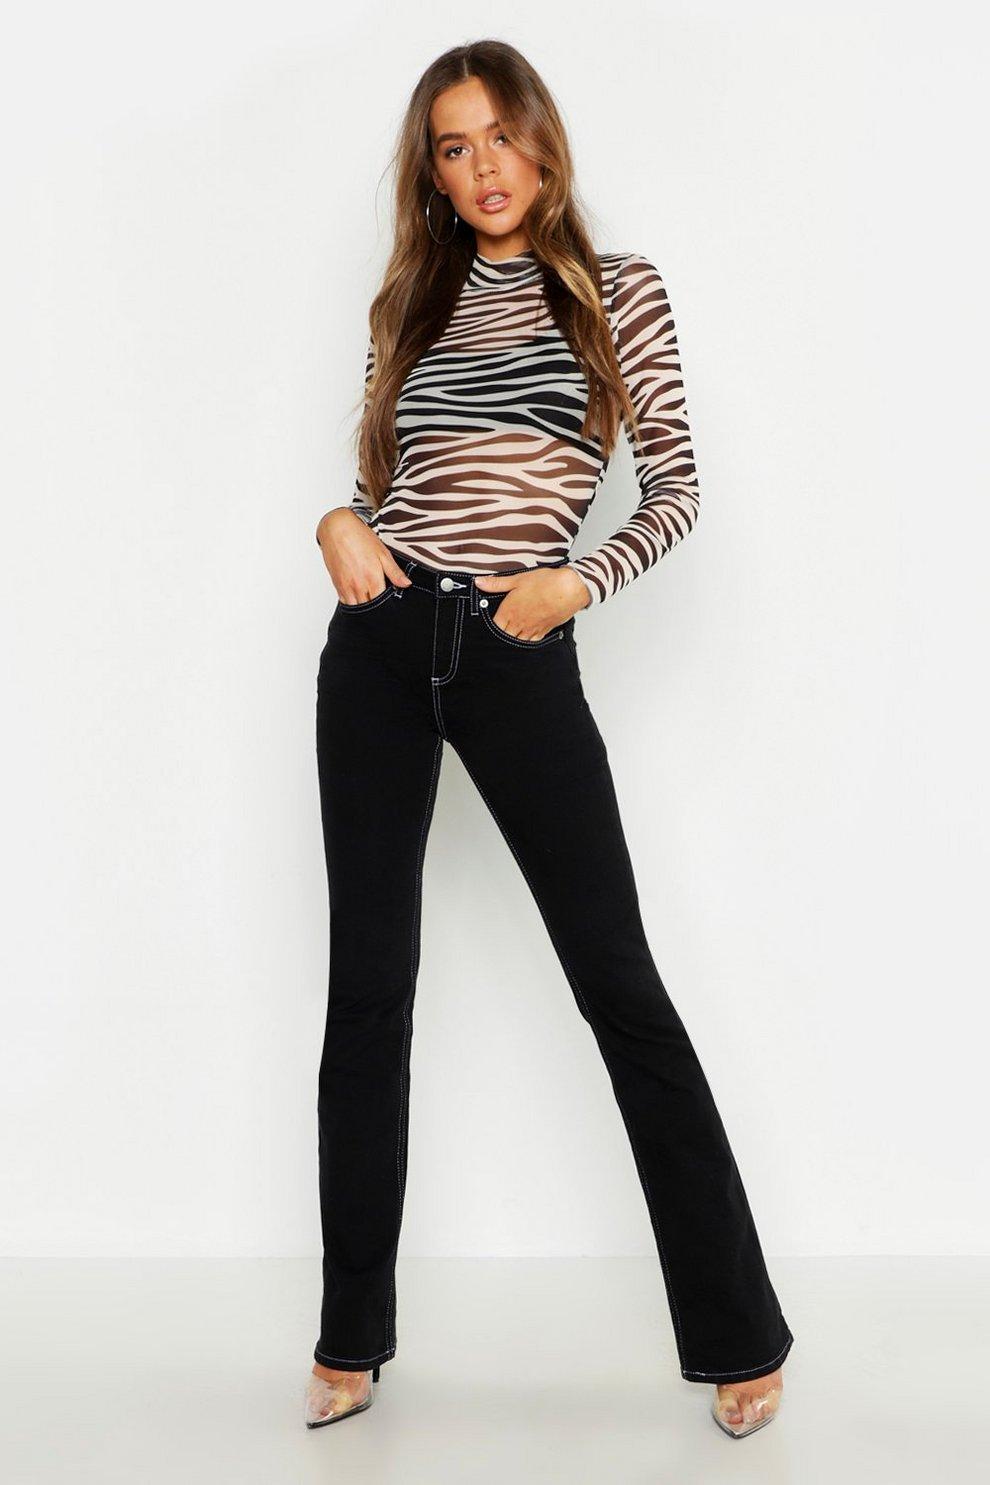 869461bd1ee2 High Rise Contrast Stitch Stretch Flare Jean | Boohoo